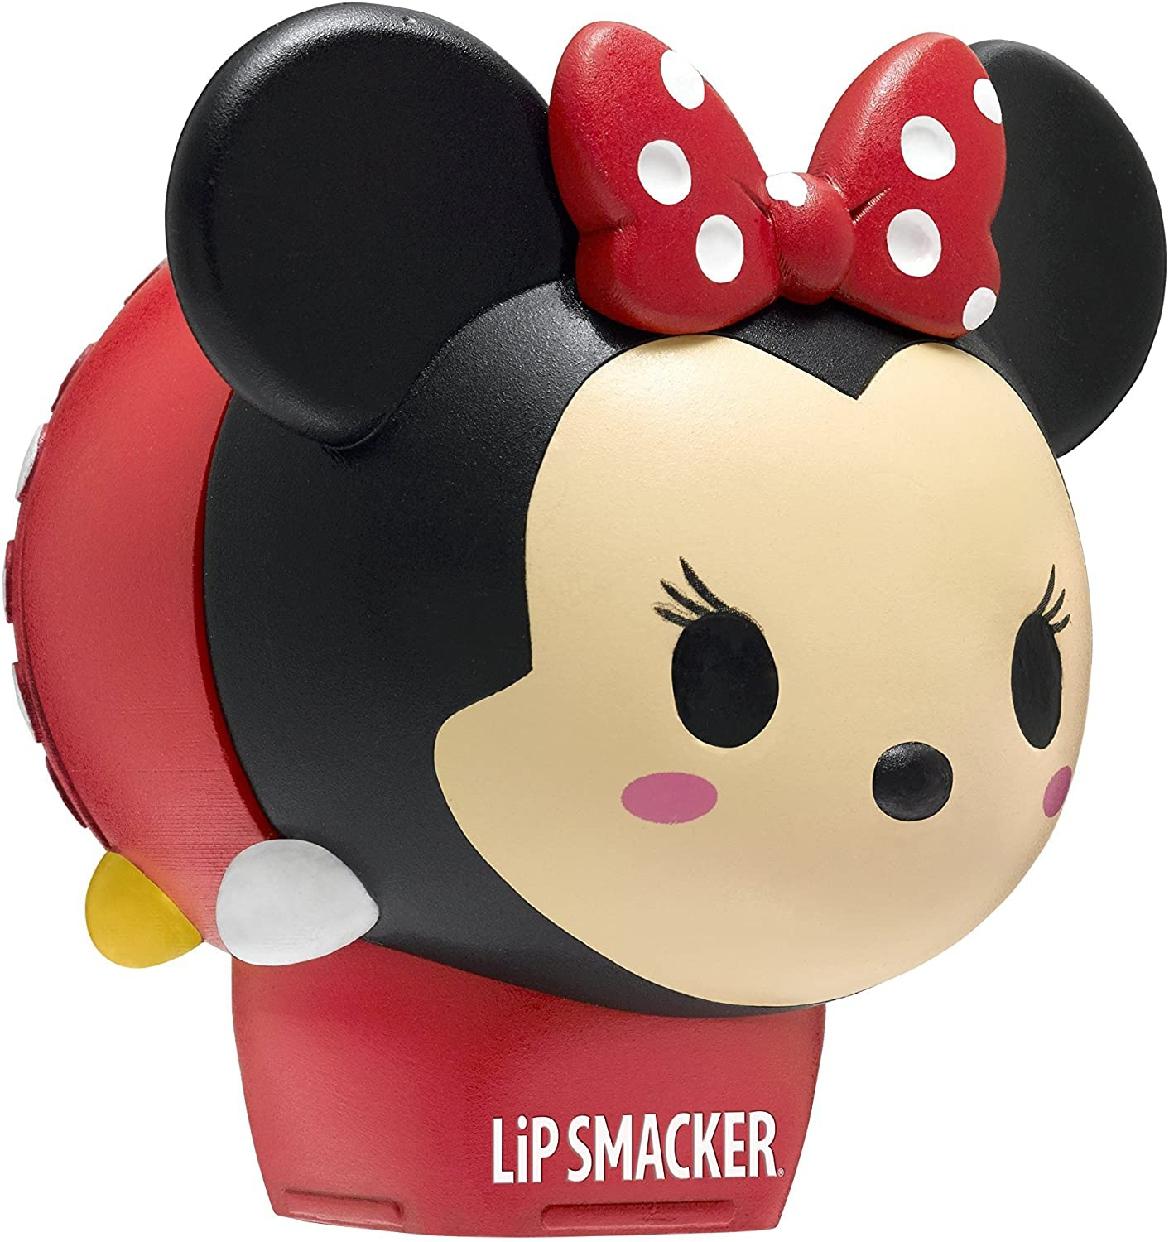 Lip Smacker(リップスマッカー) ミニーマウス【ストロベリーロリポップフレーバー】の商品画像7